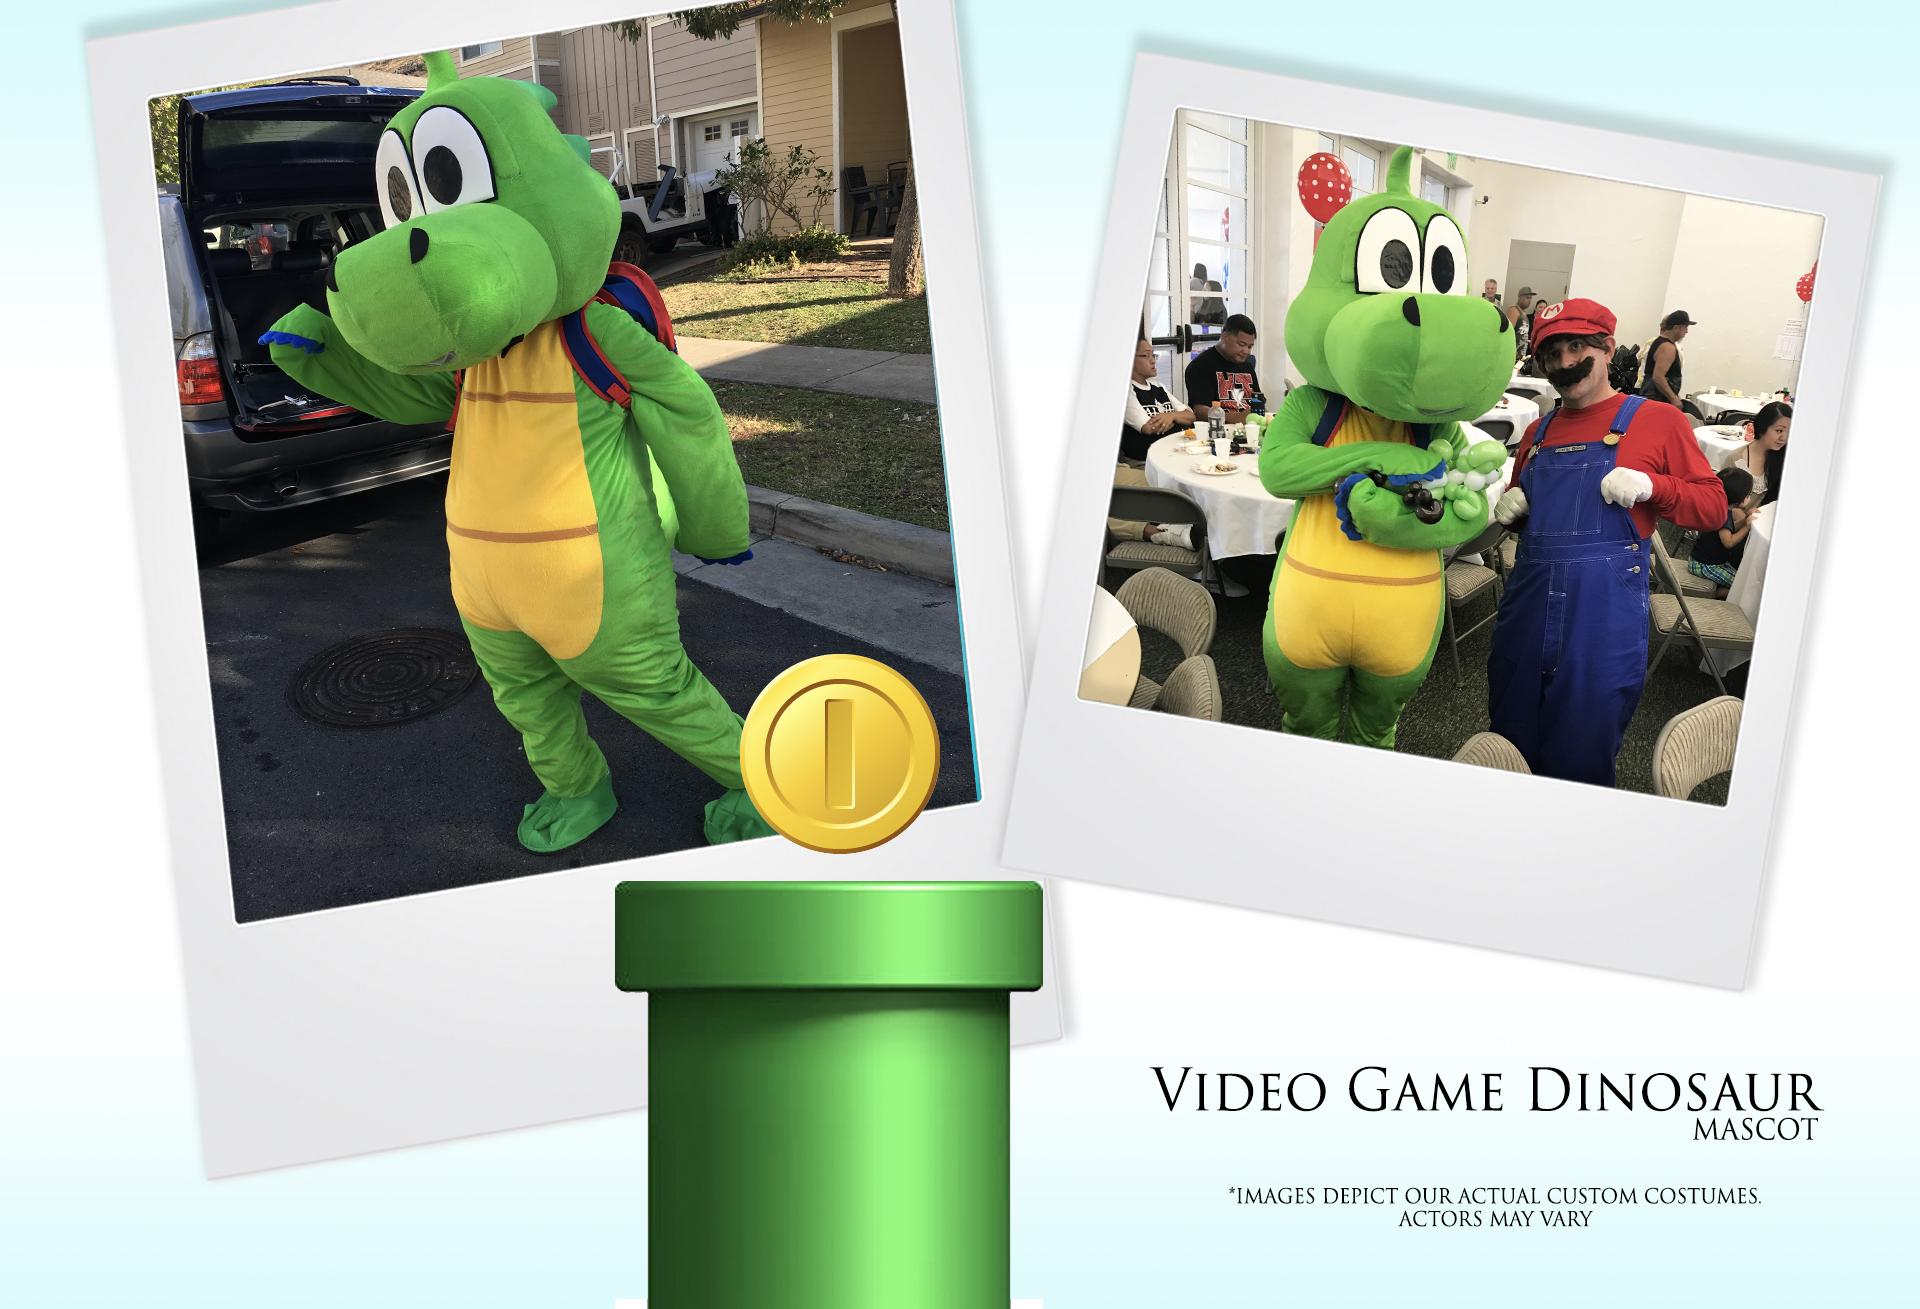 Video Game Dinosaur